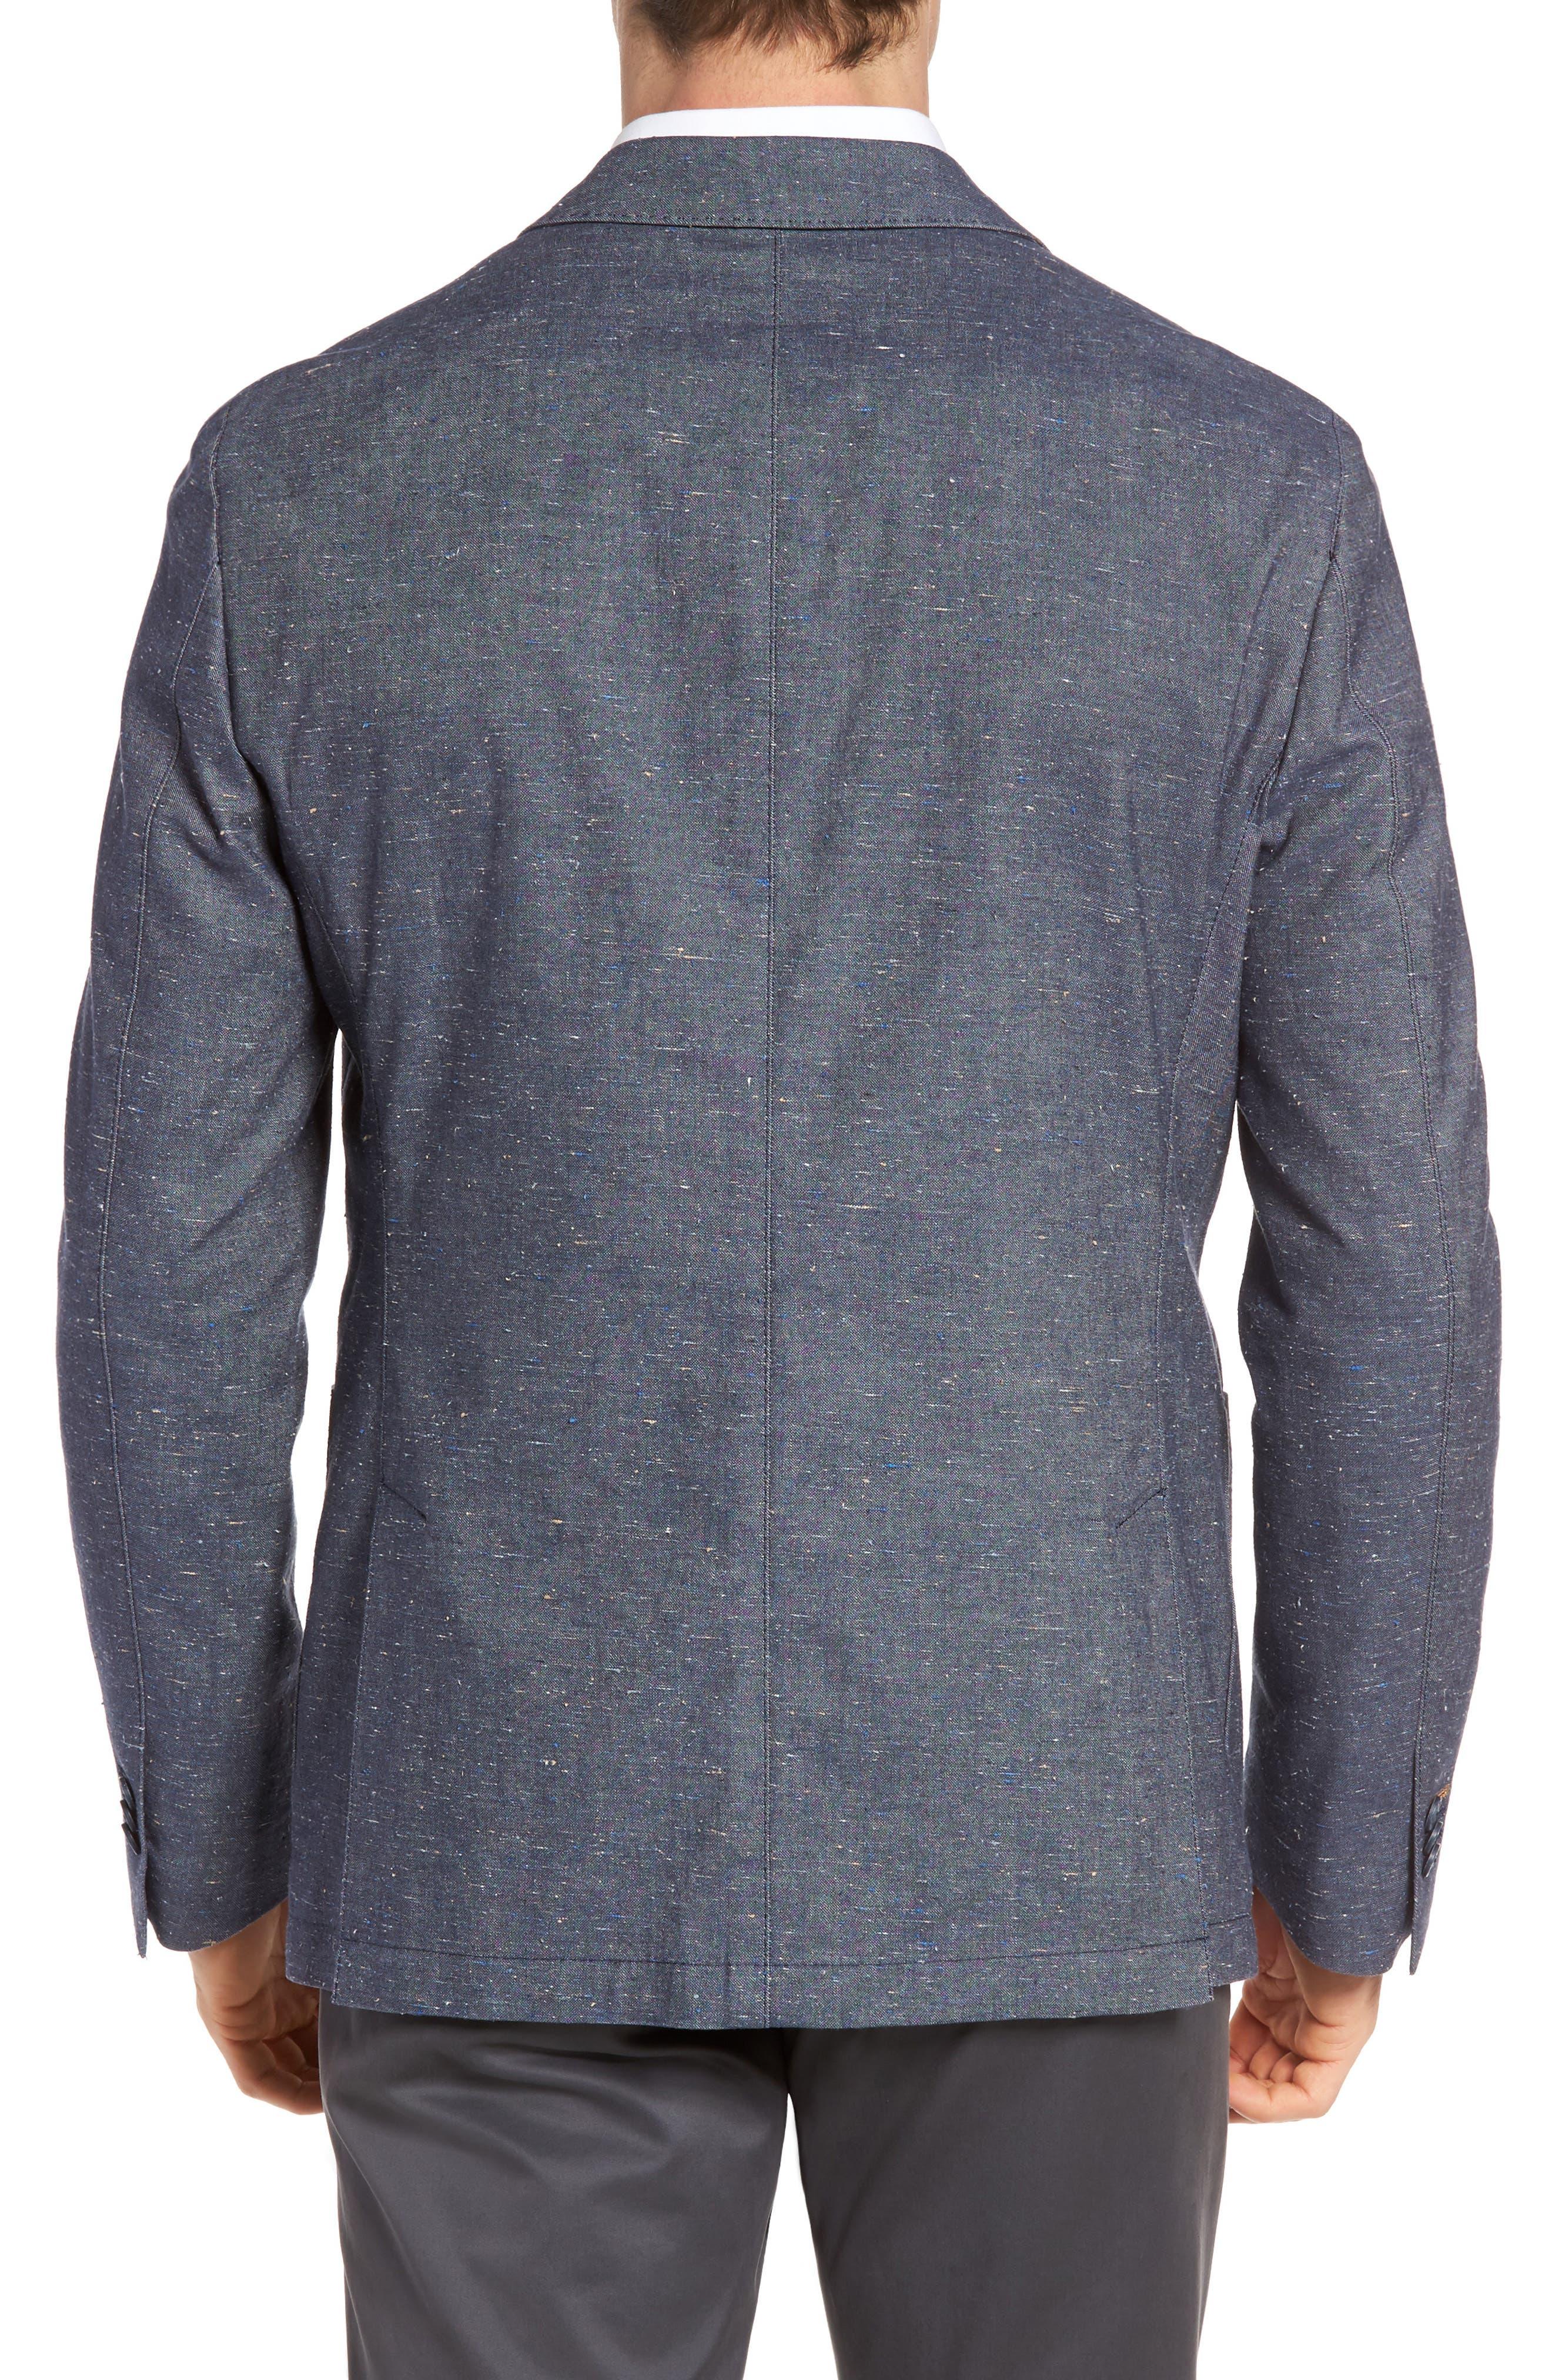 Draper Herringbone Sport Coat,                             Alternate thumbnail 2, color,                             420